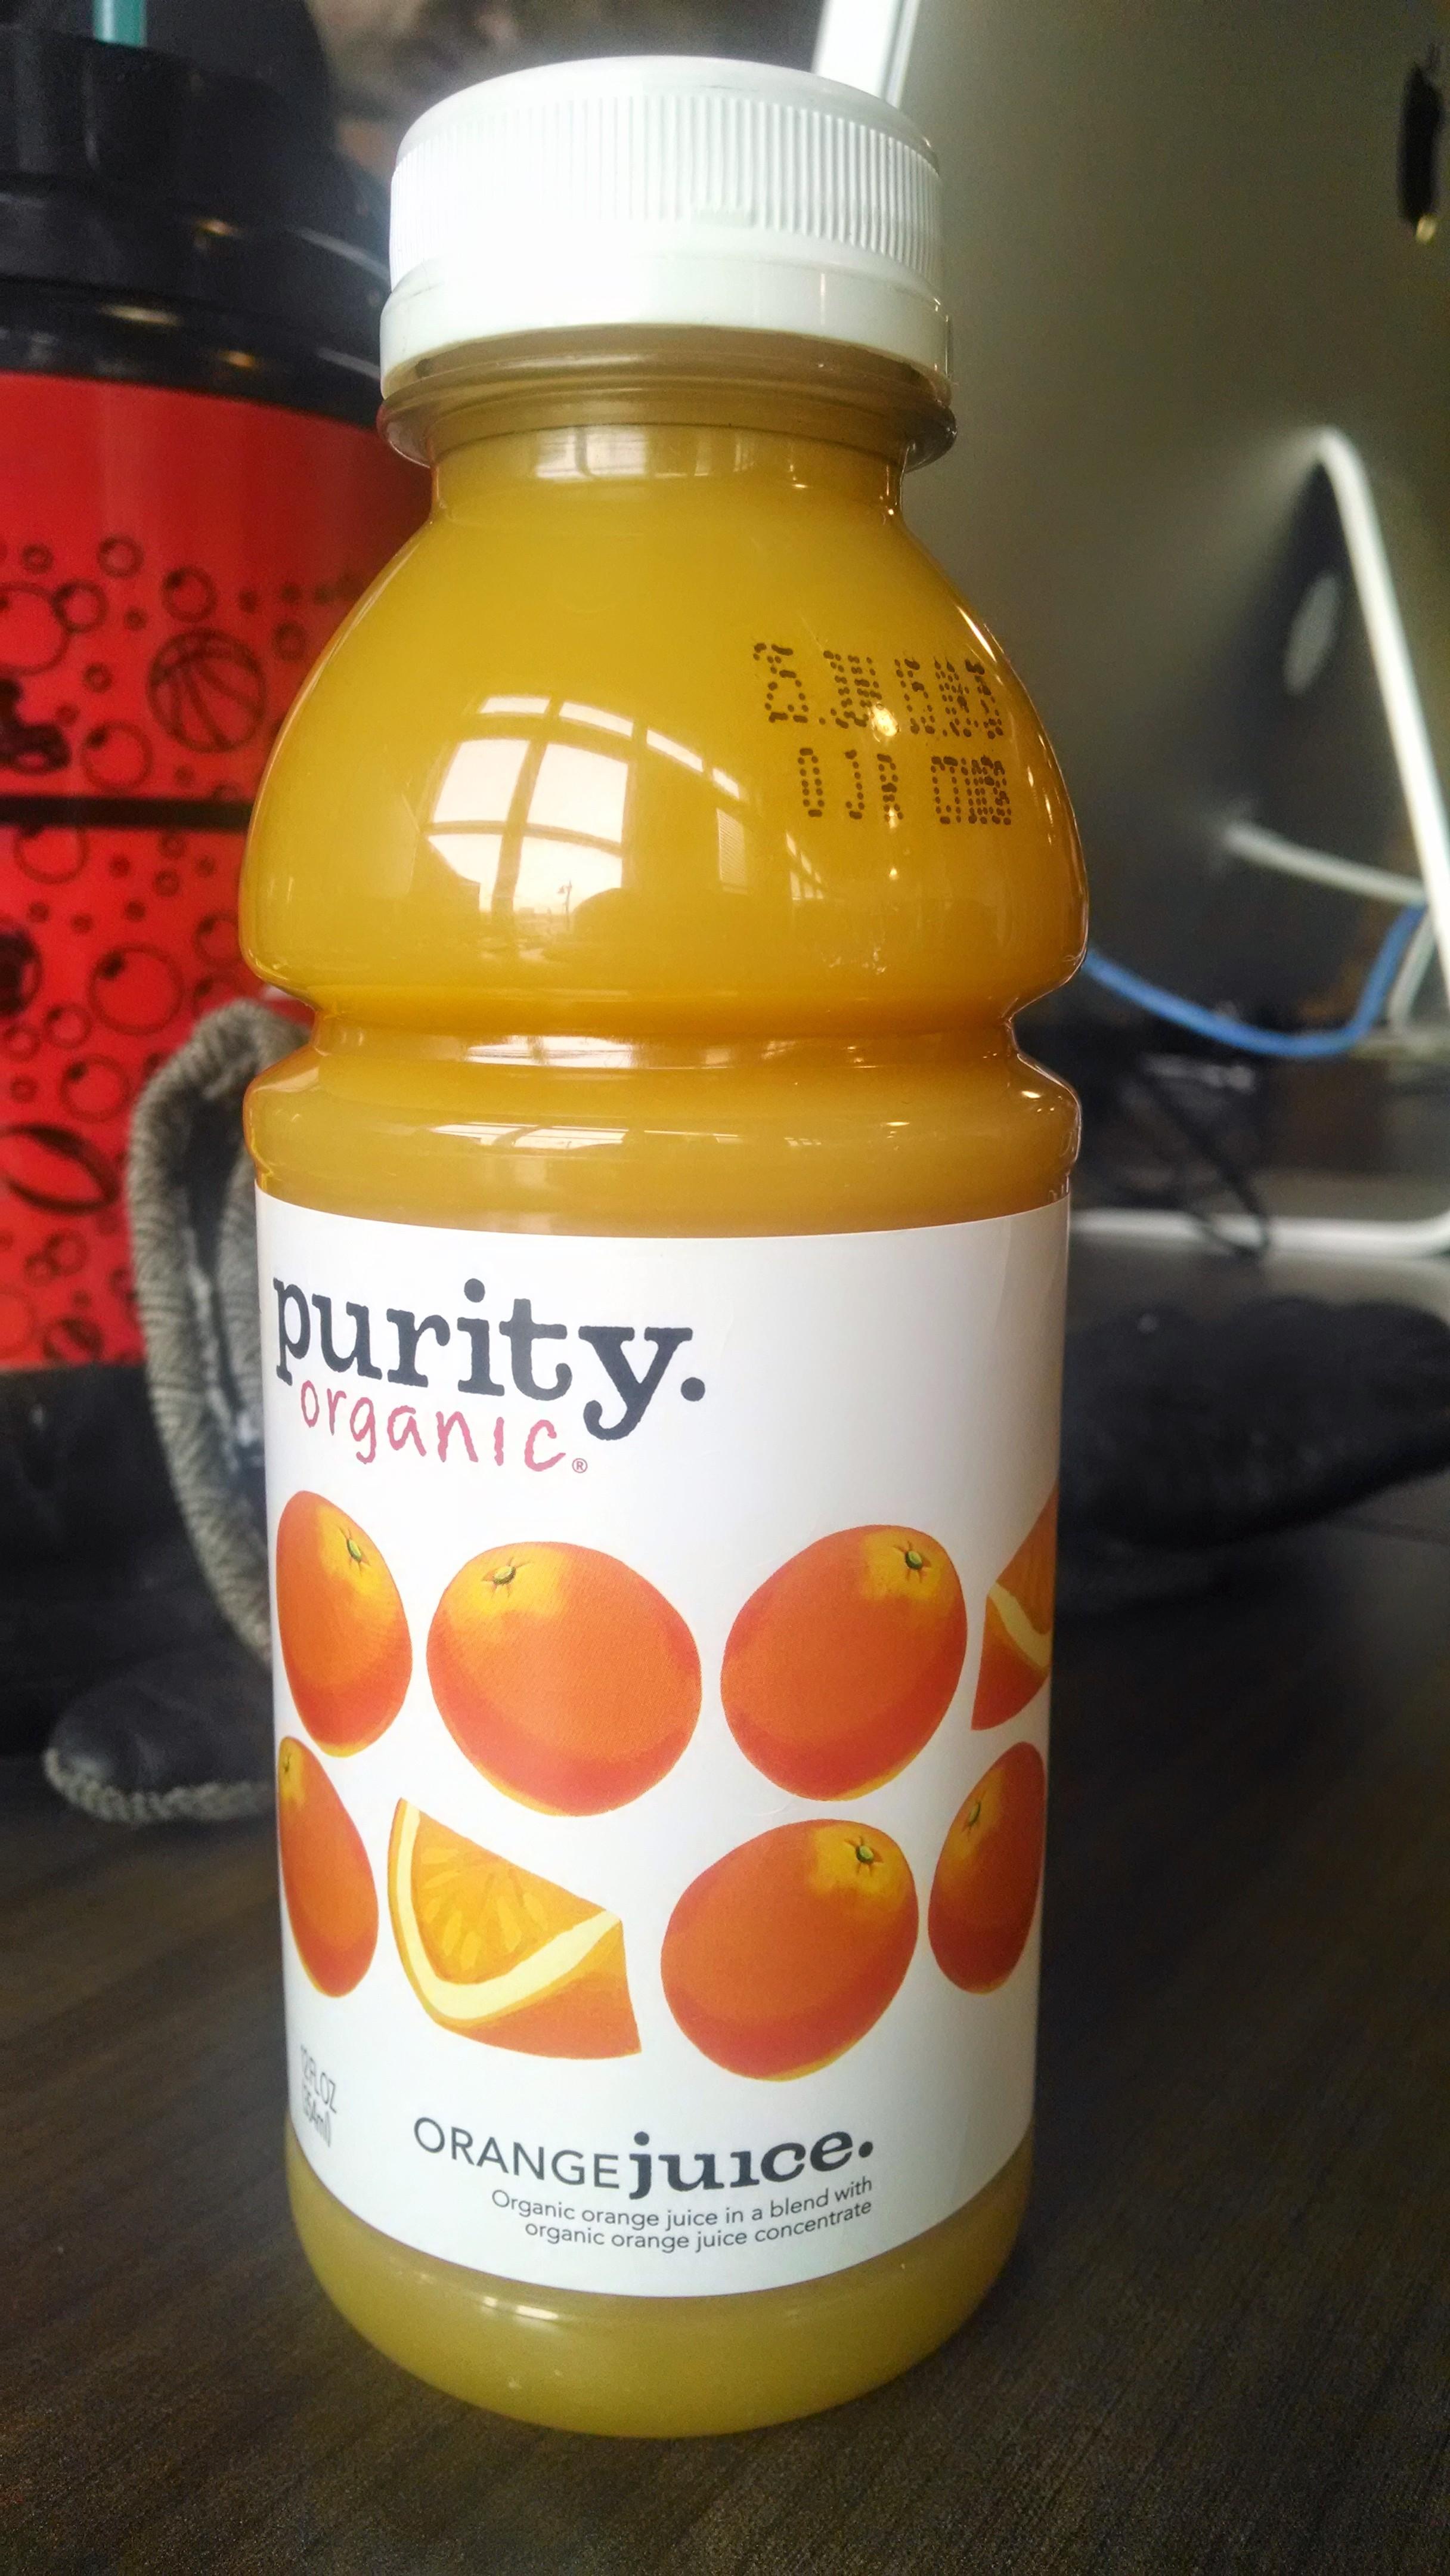 Thirsty Dudes Purity Organic Orange Juice